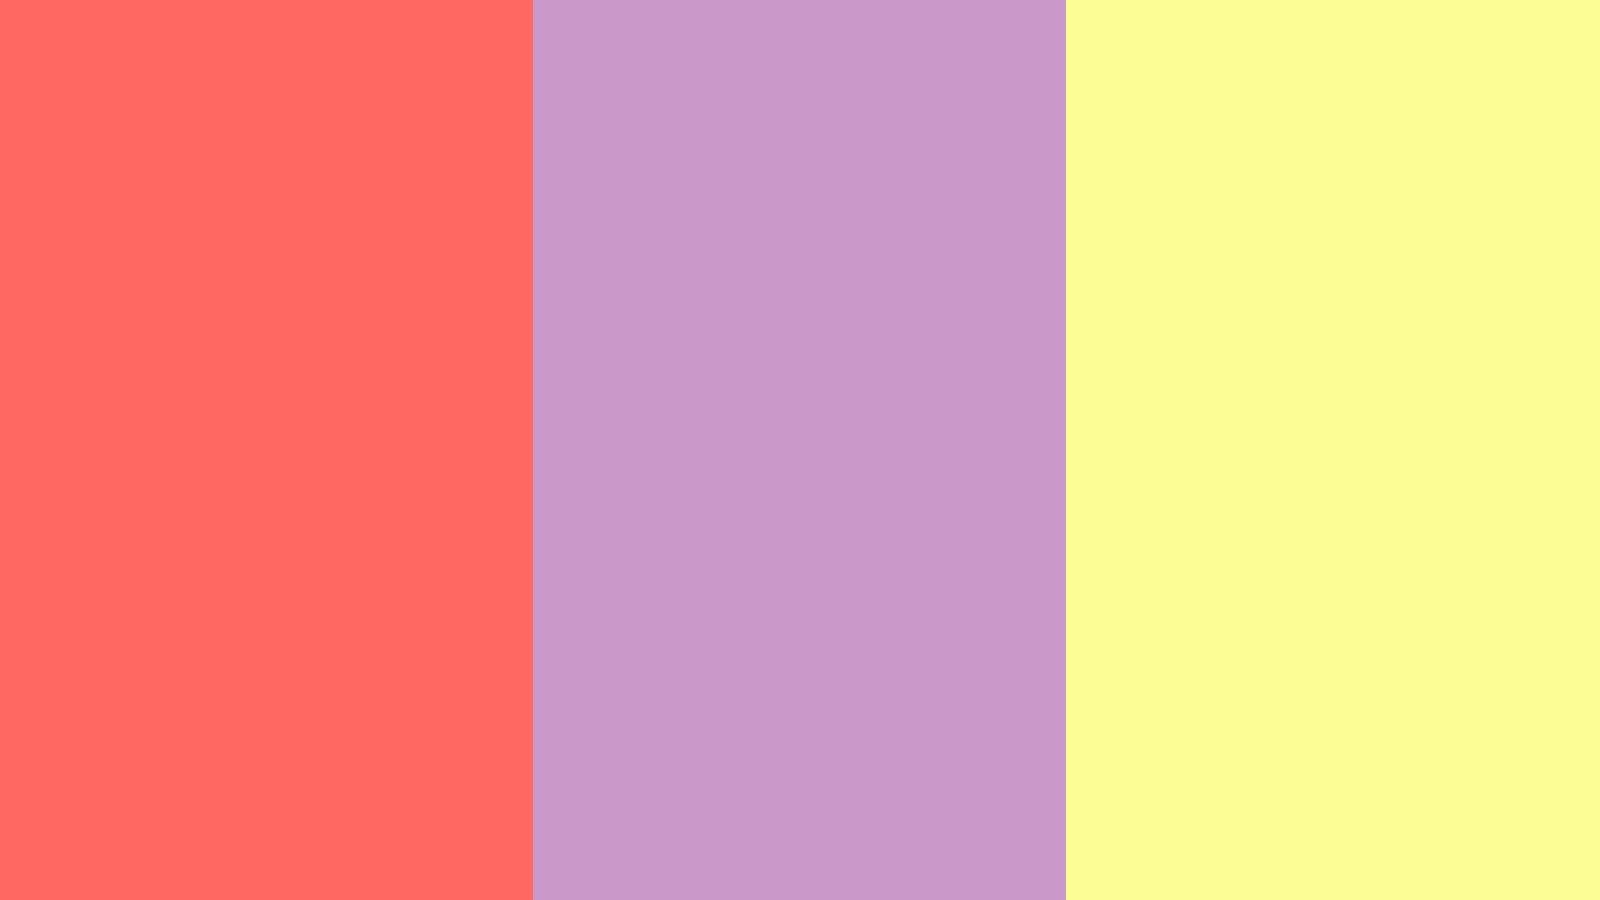 pastel red pastel violet pastel yellow three color backgroundjpg 1600x900